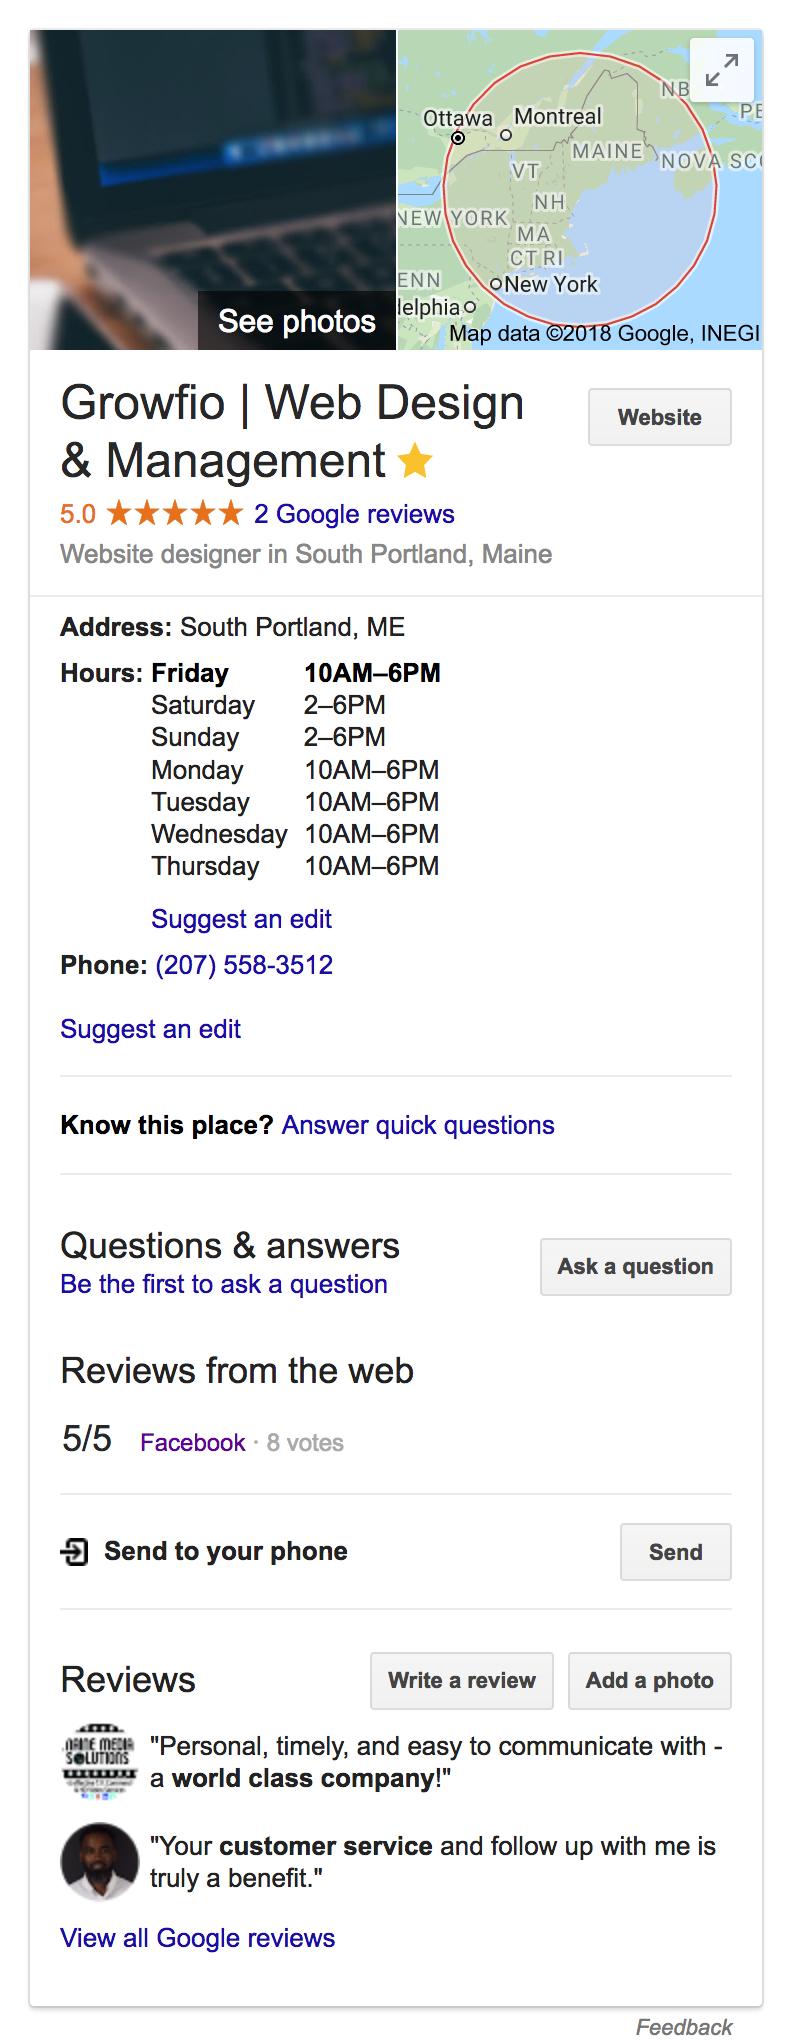 Growfio on Google My Business